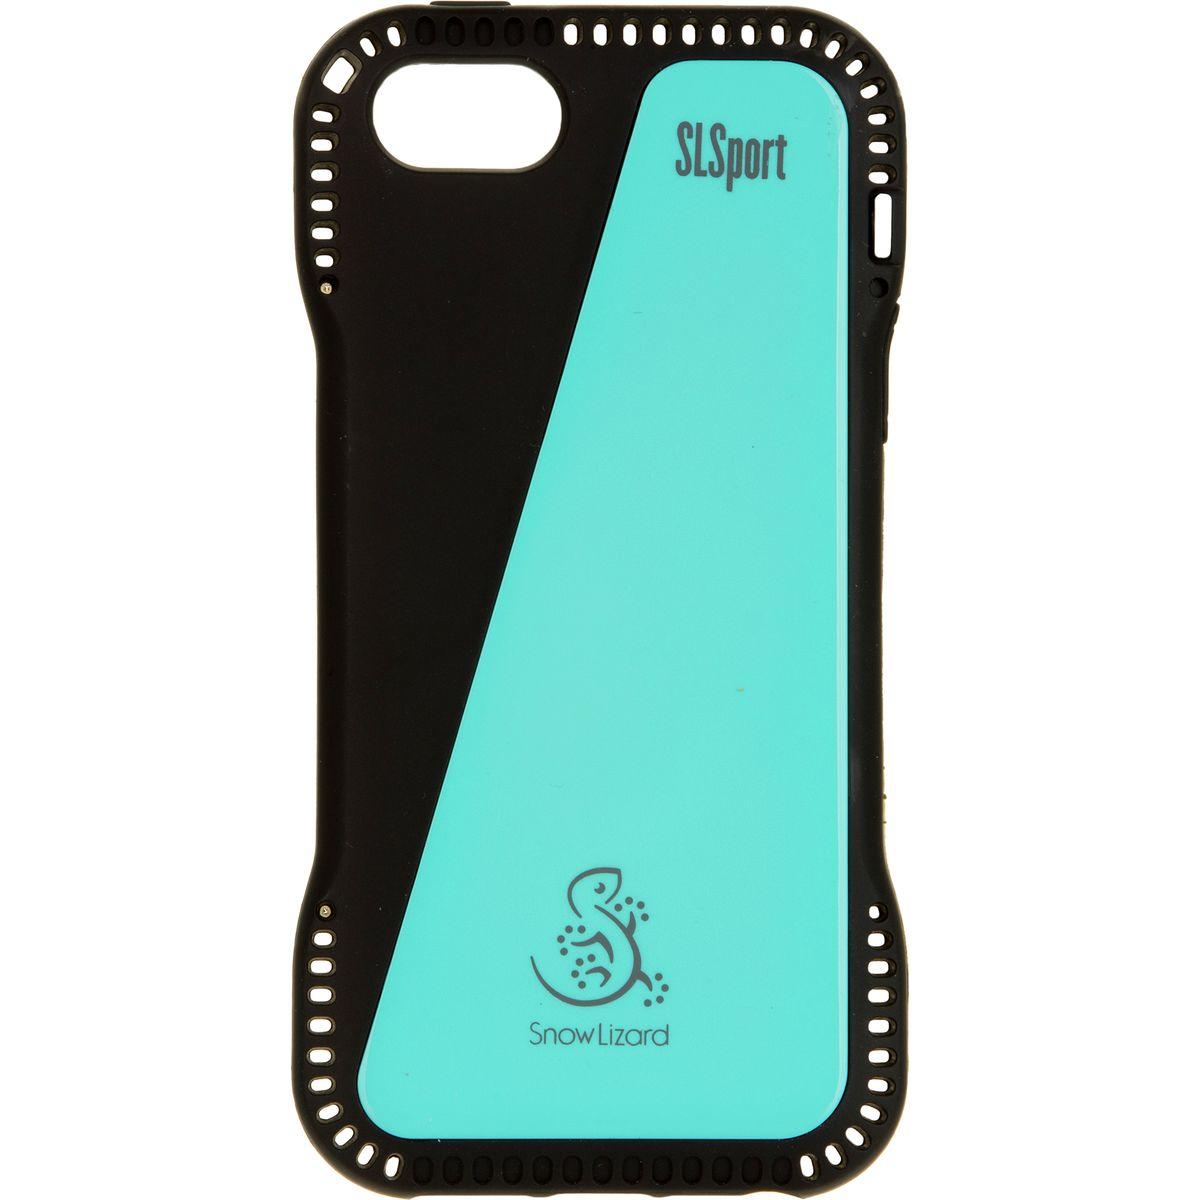 Snow Lizard SLSport iPhone 5 Case